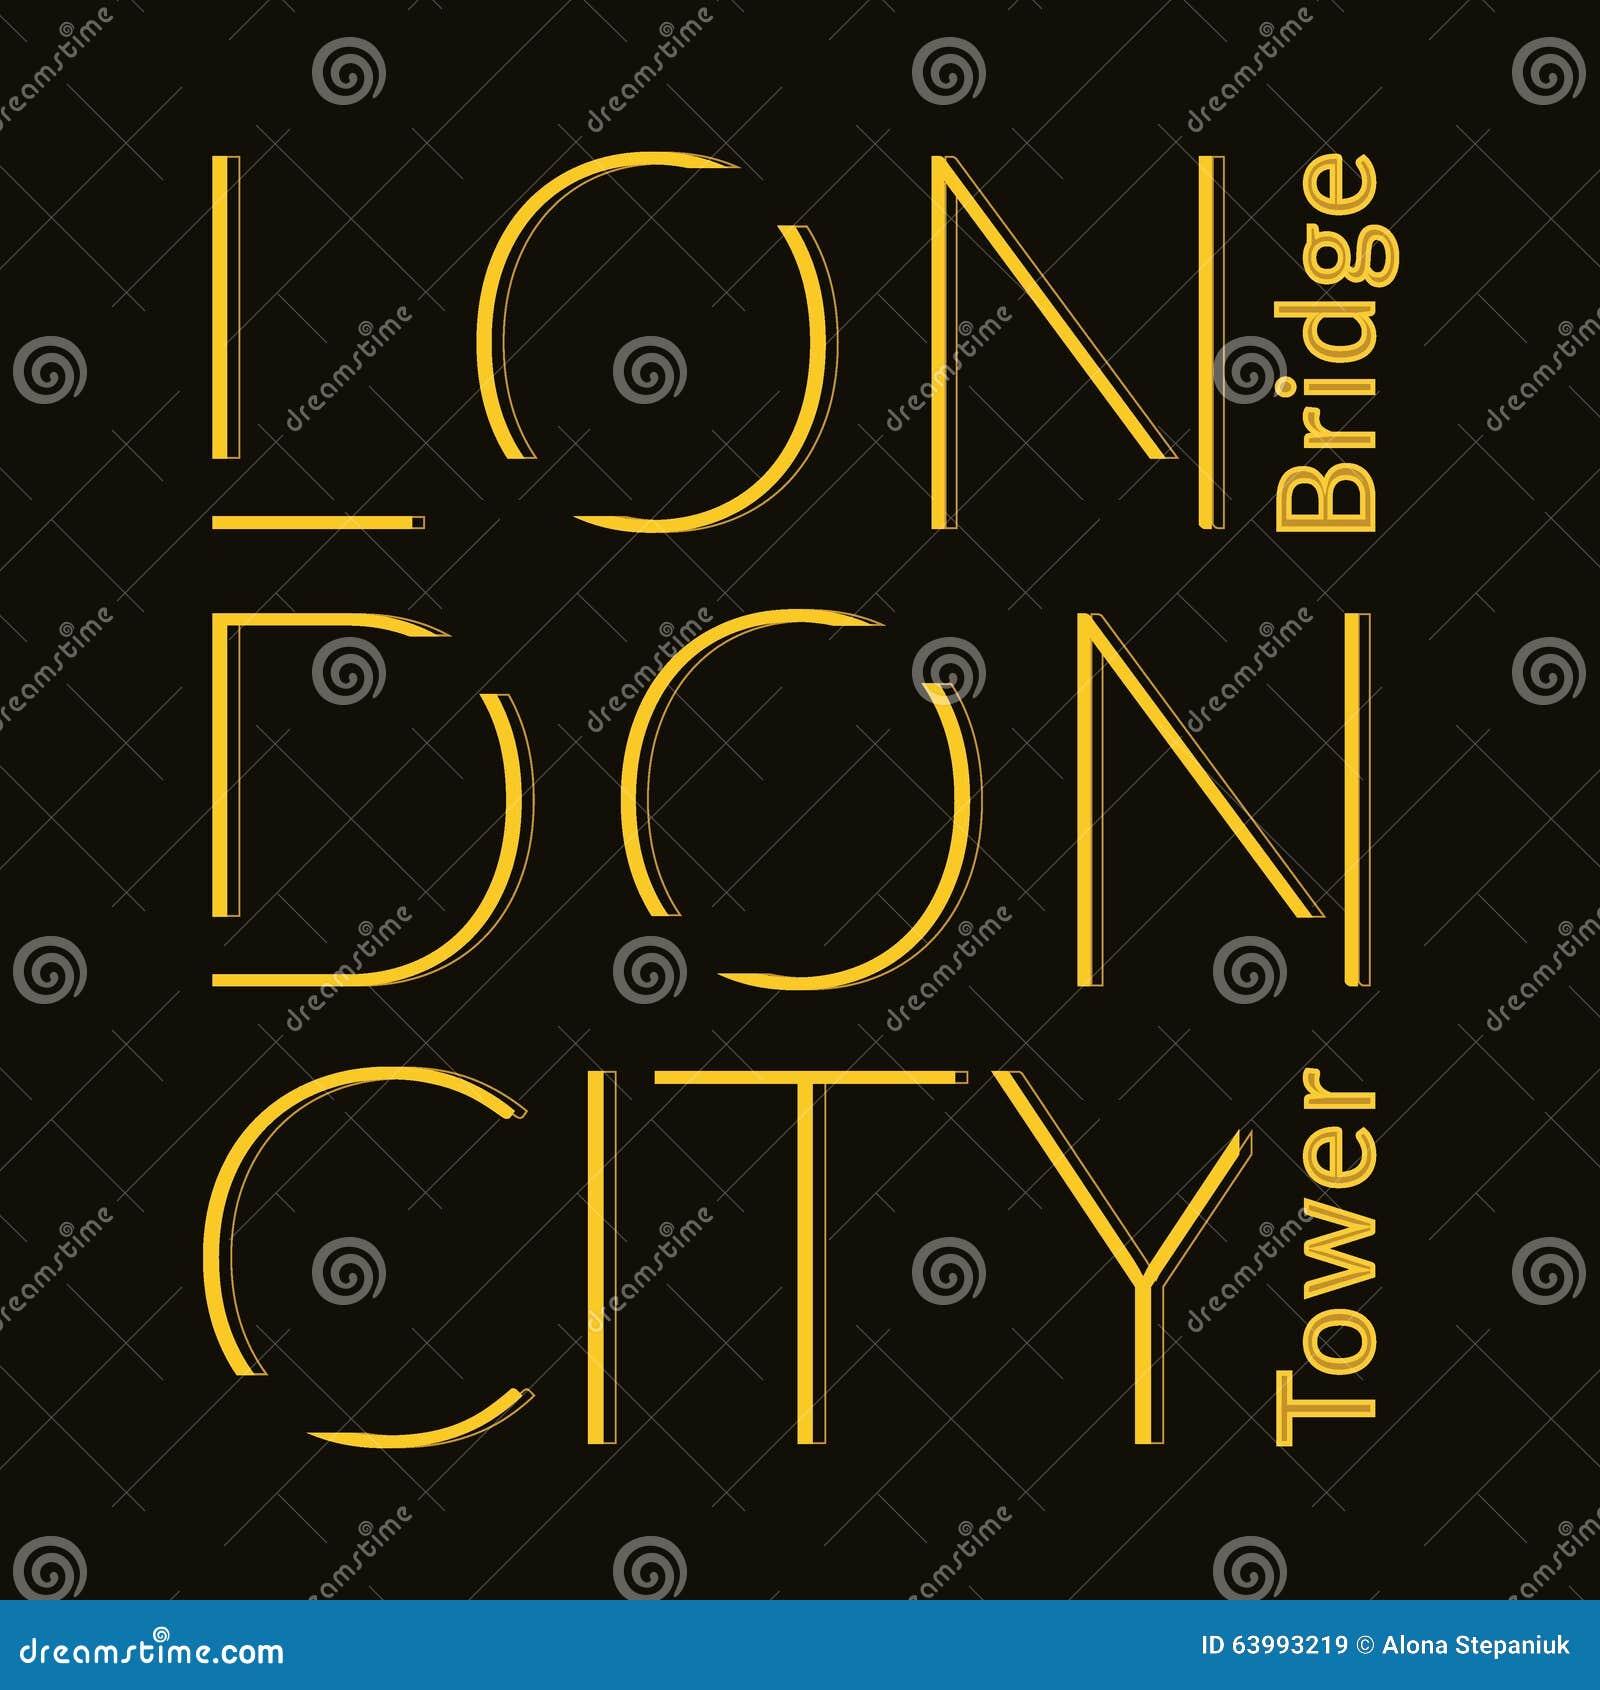 Shirt design london - London City T Shirt